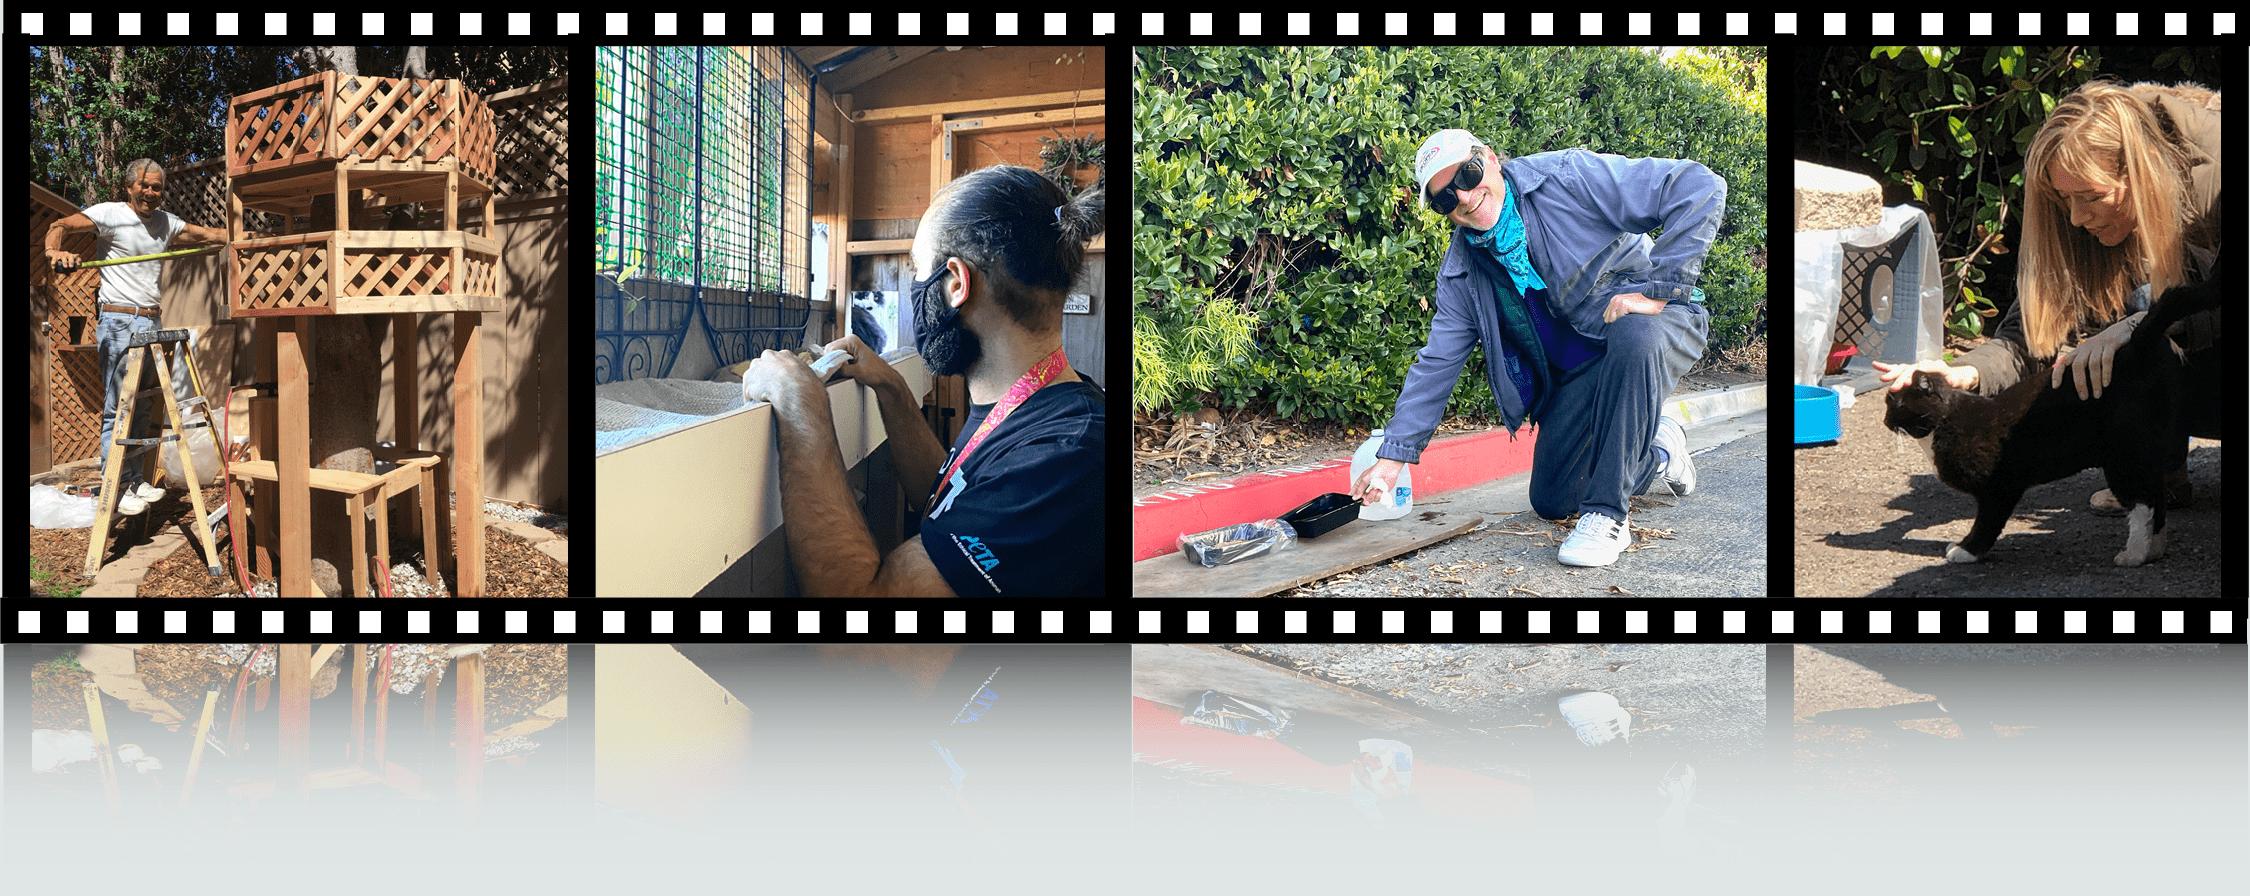 Filmstrip - Shanti's House Action Shots 4